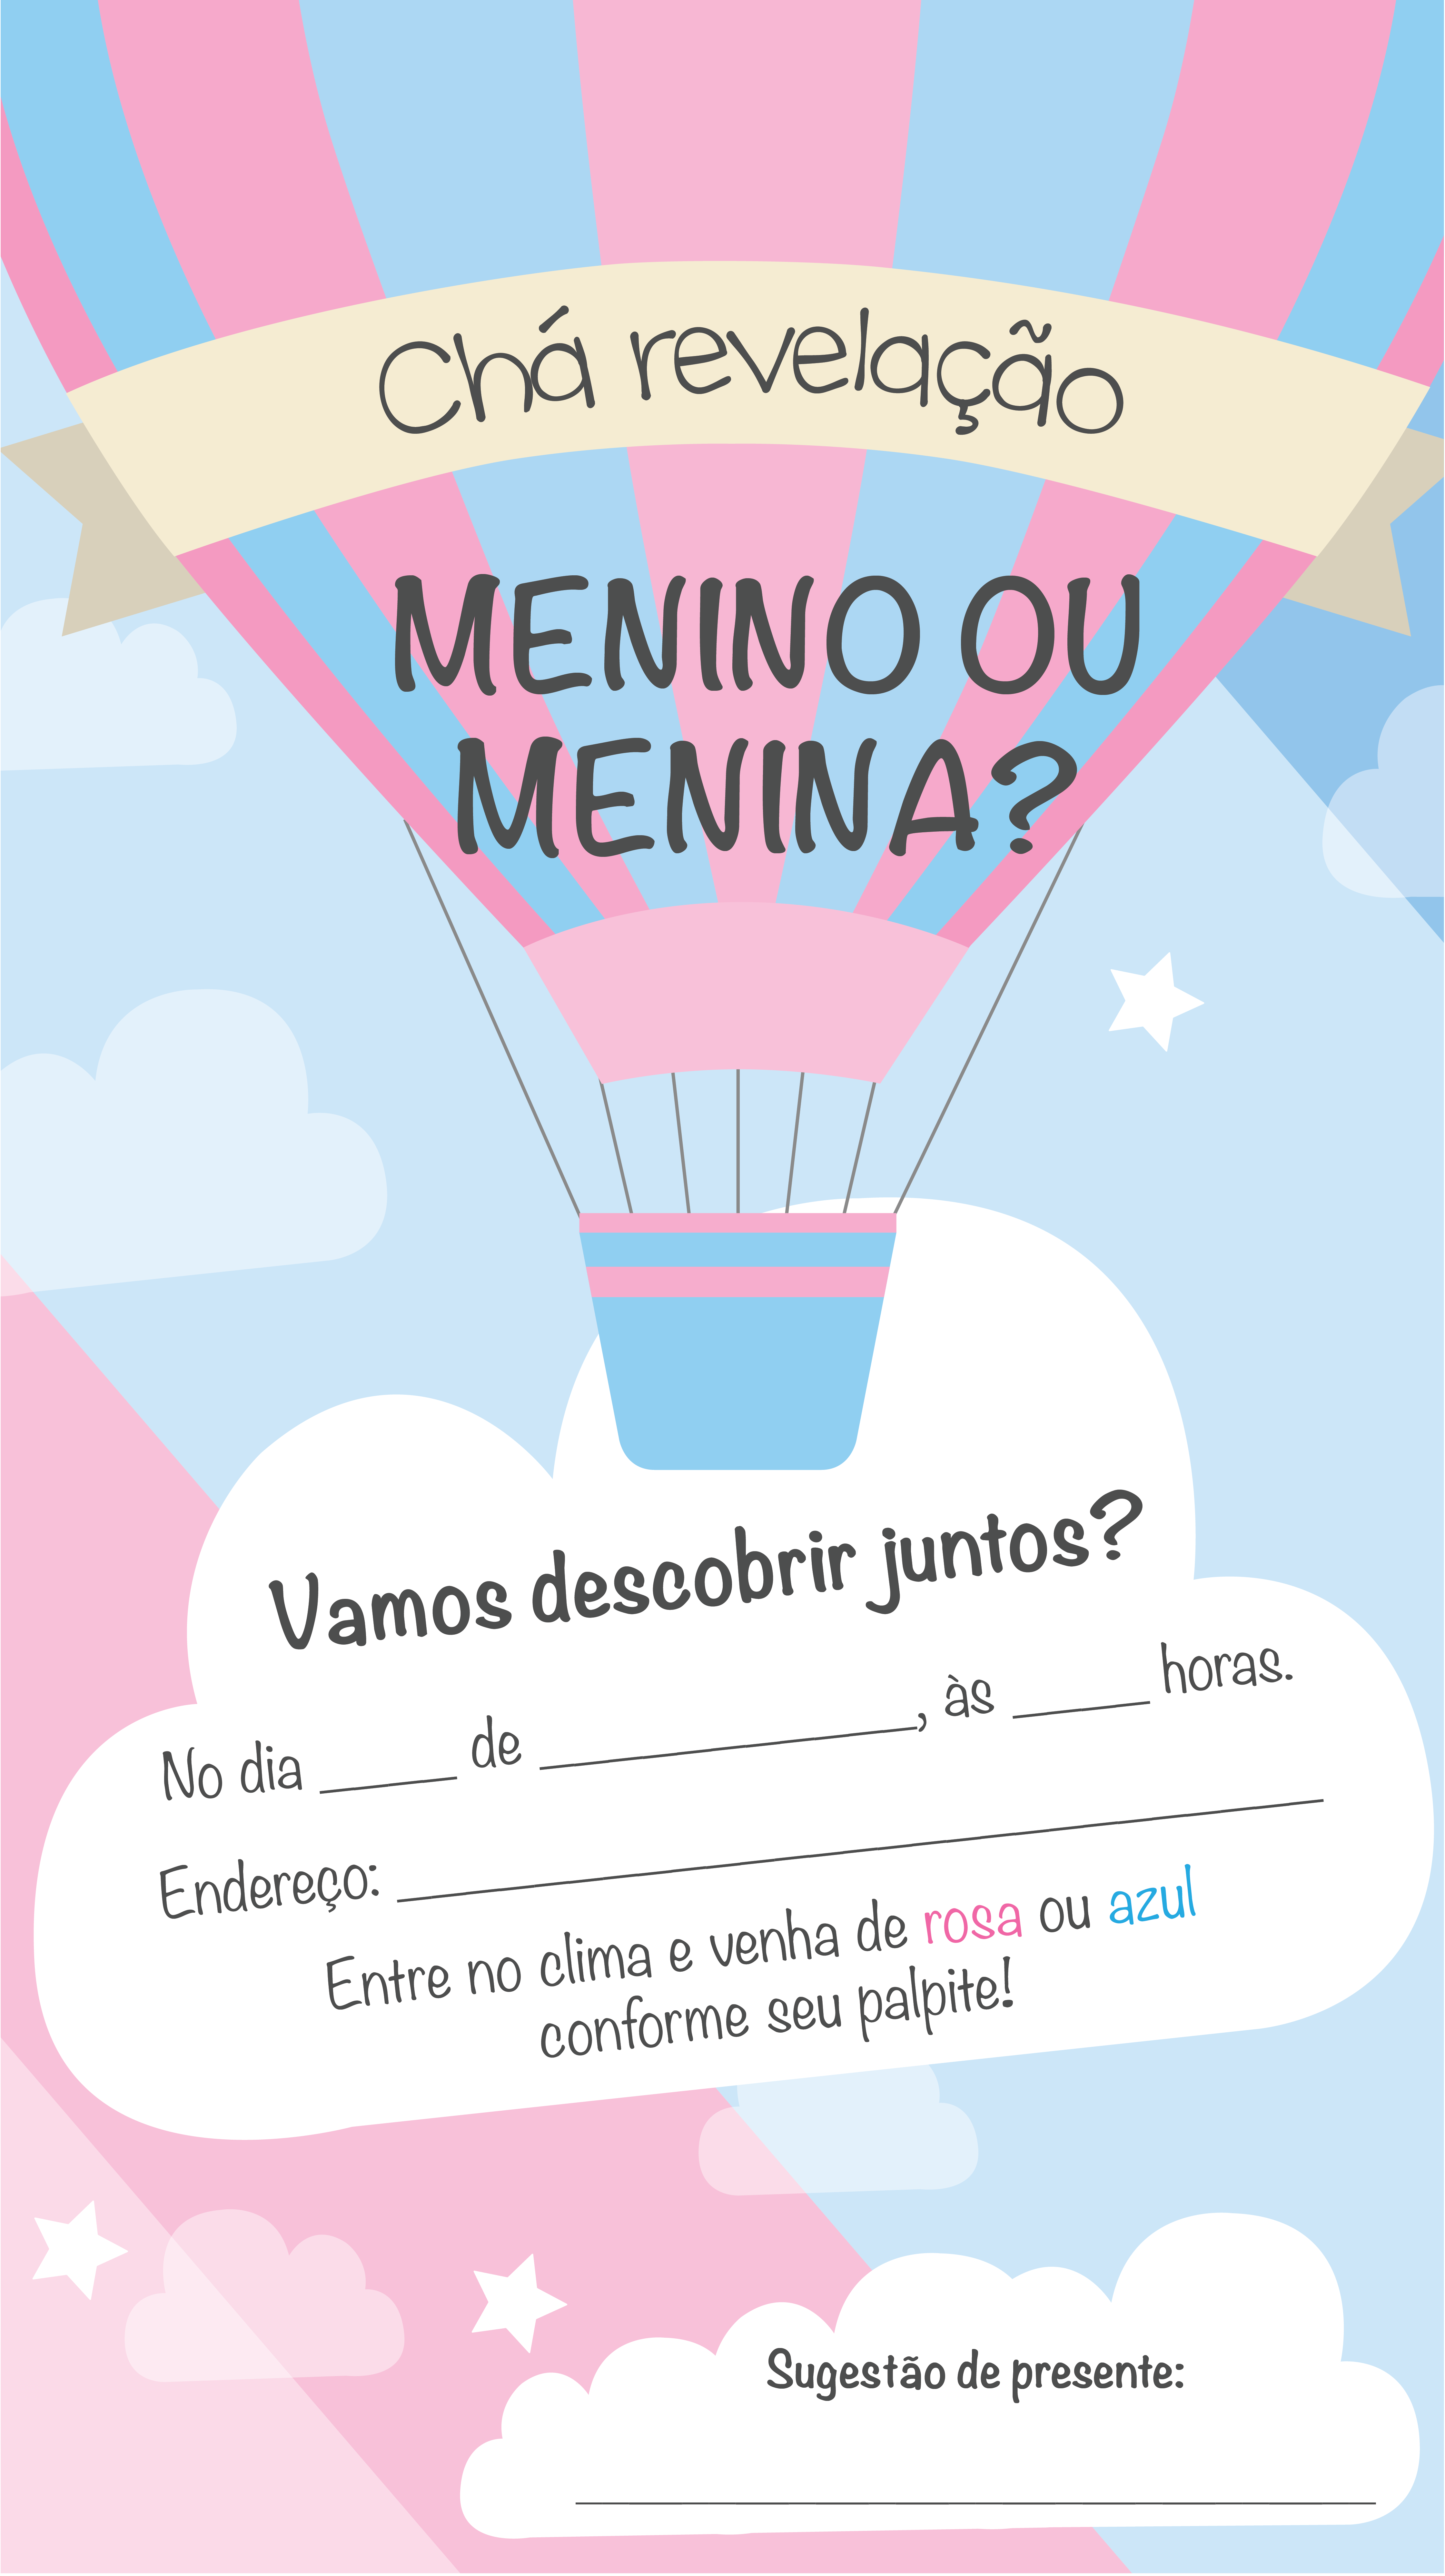 convite_cha_revevelacao_balao